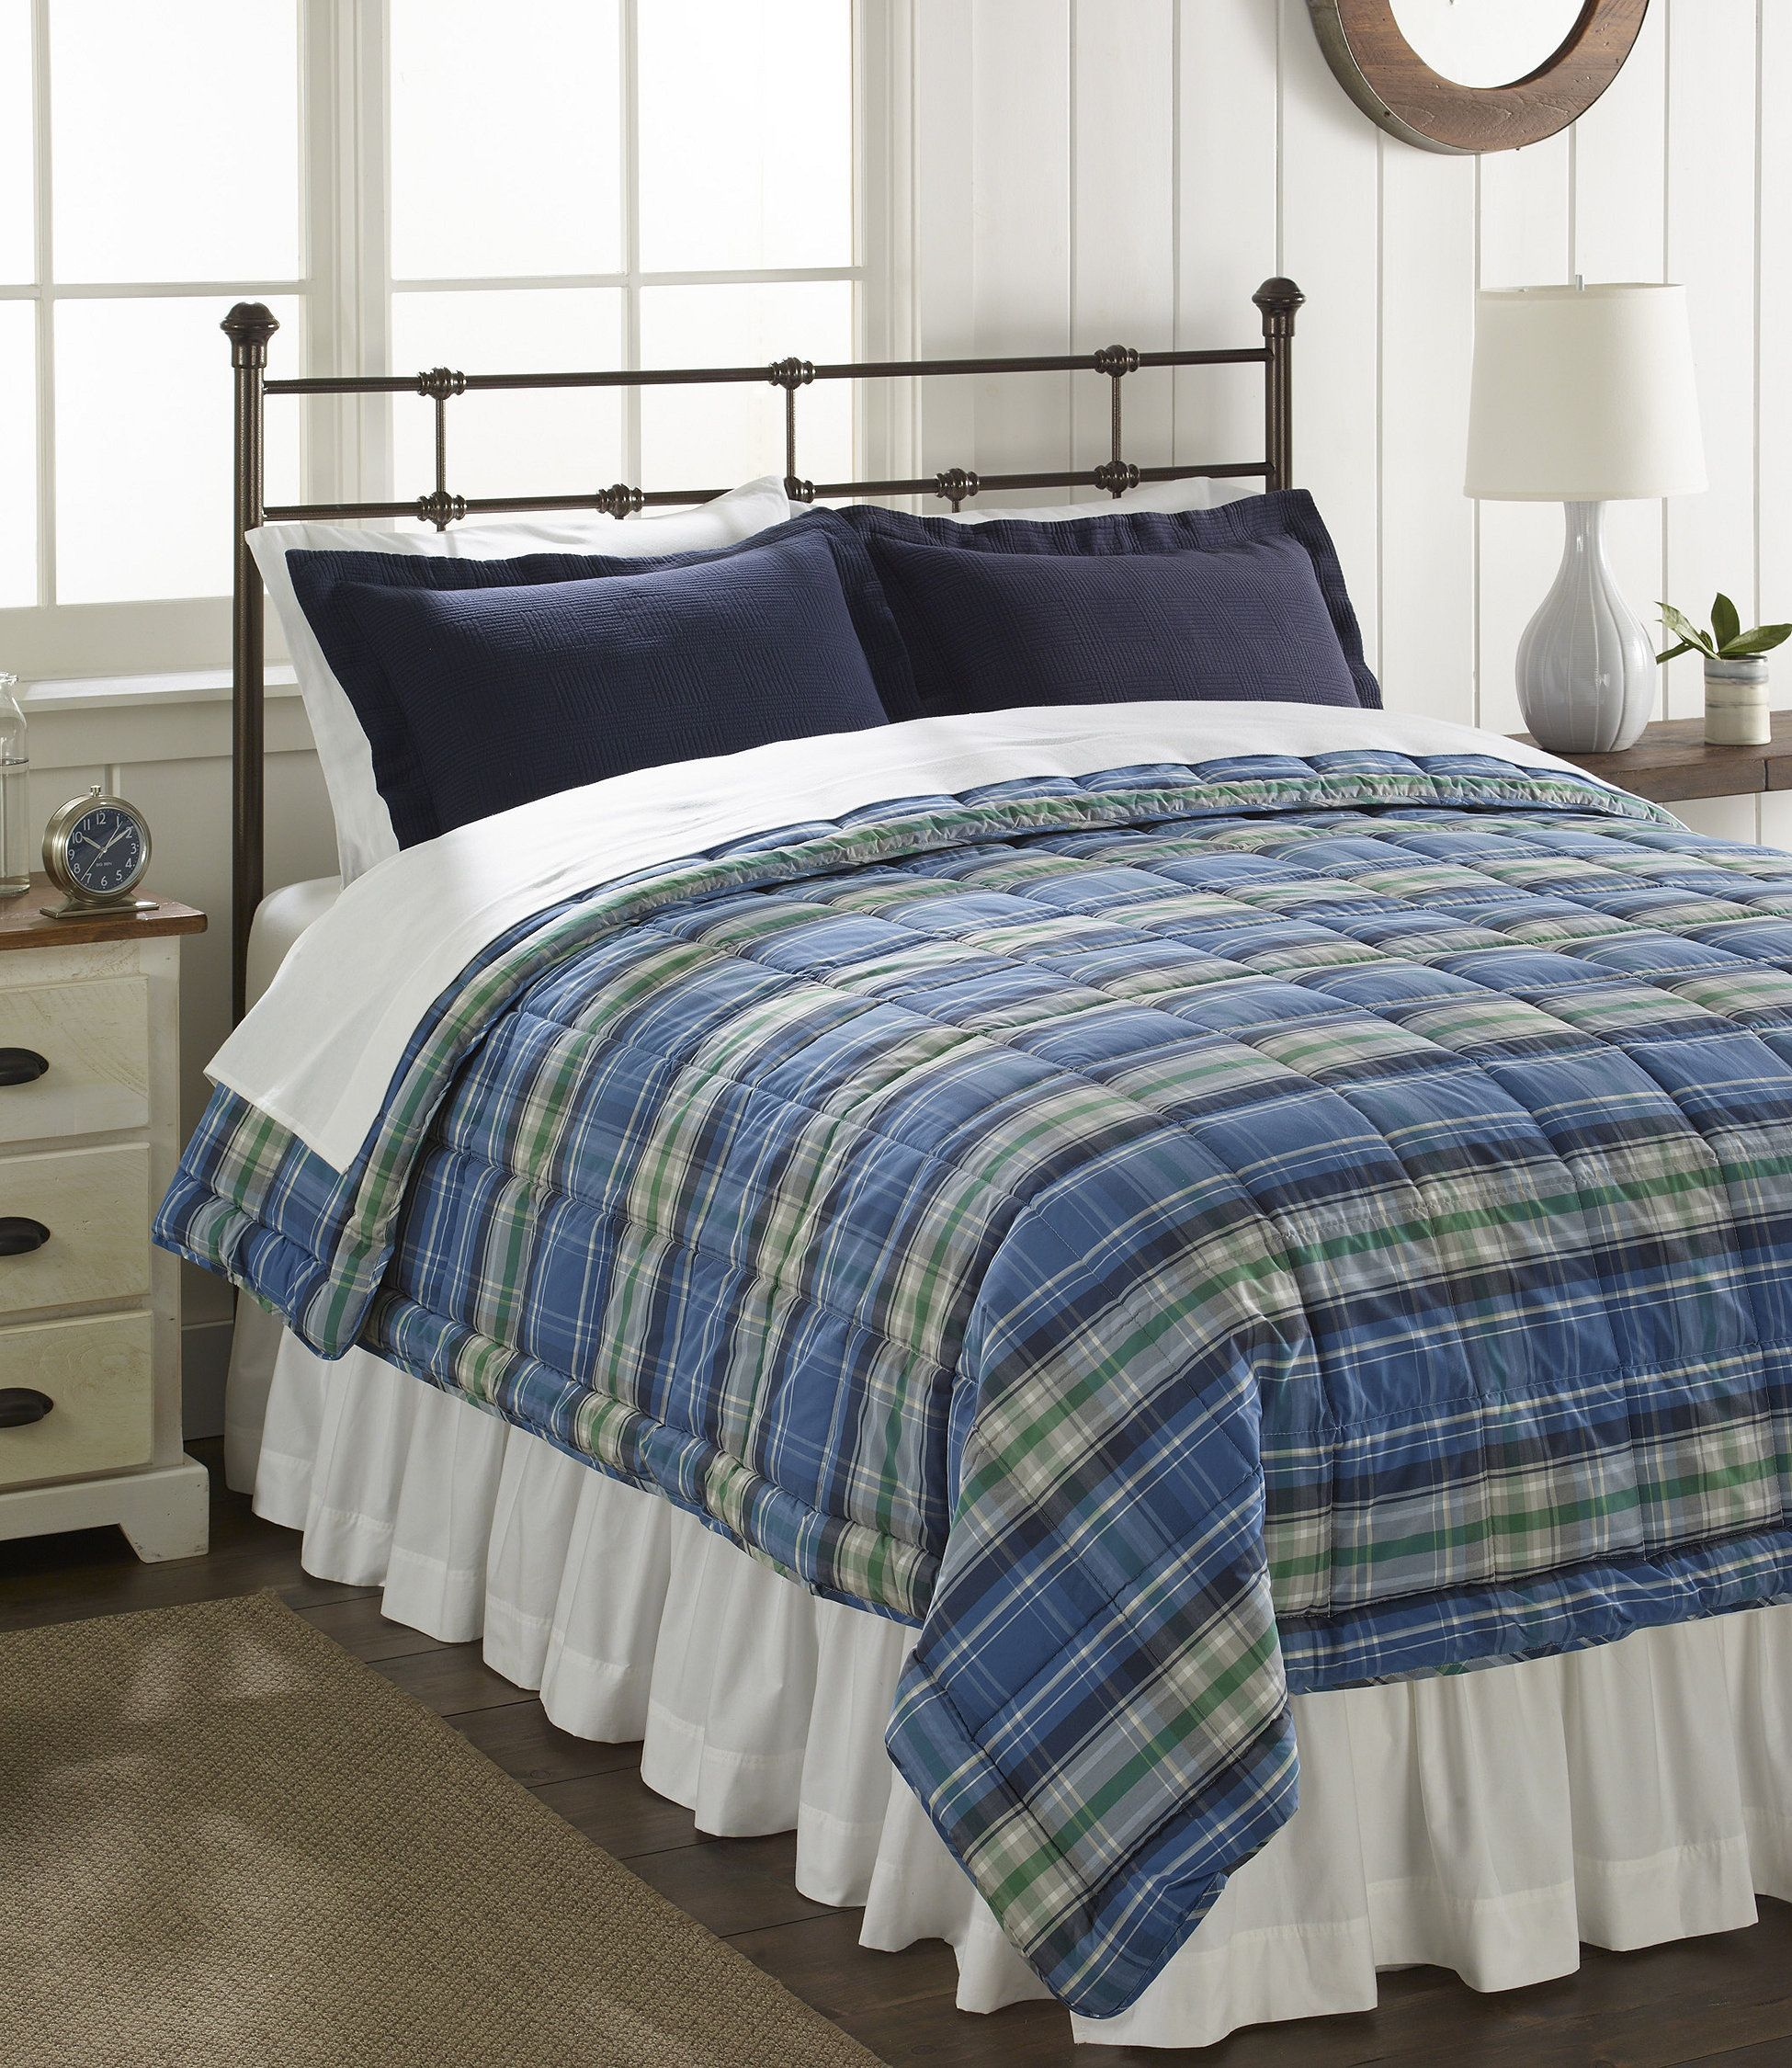 Ultrasoft Cotton Comforter, Plaid Farmhouse bedding sets